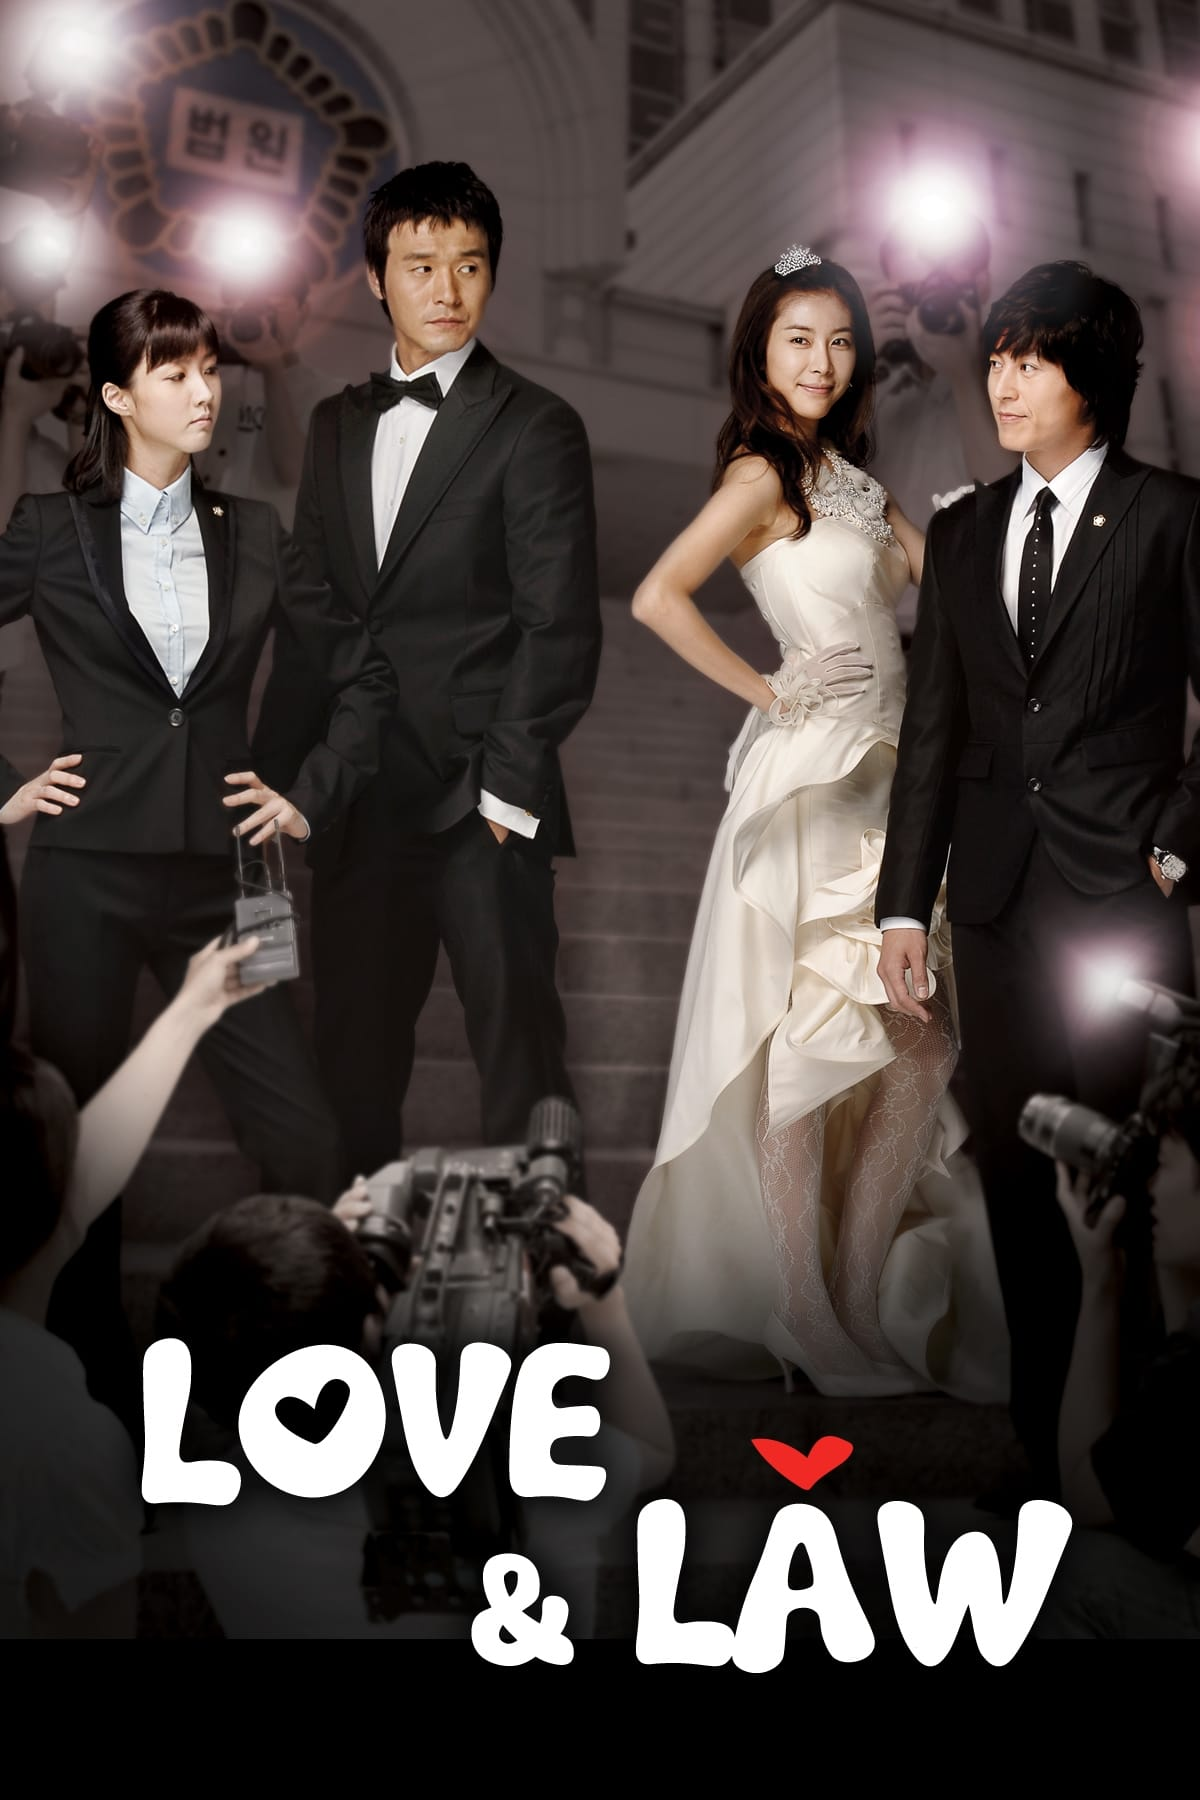 Love & Law (2008)